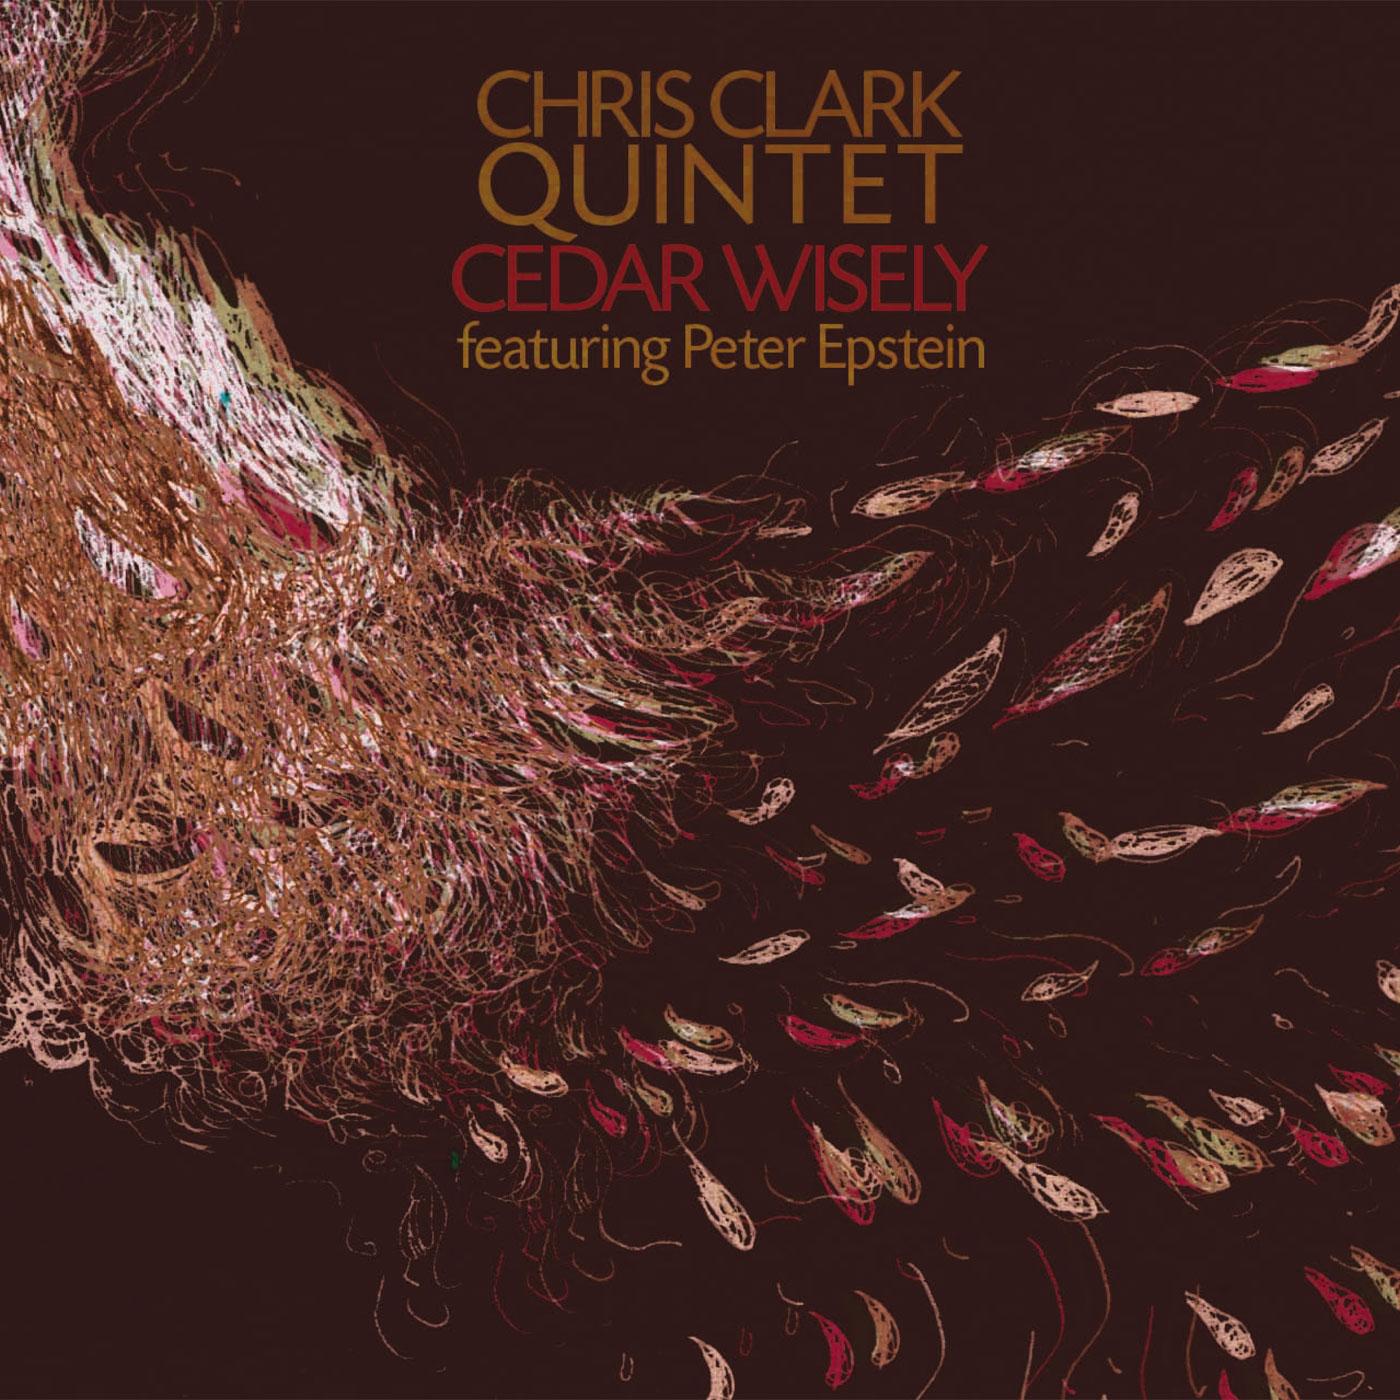 Chris Clark Quintet Cedar Wisely